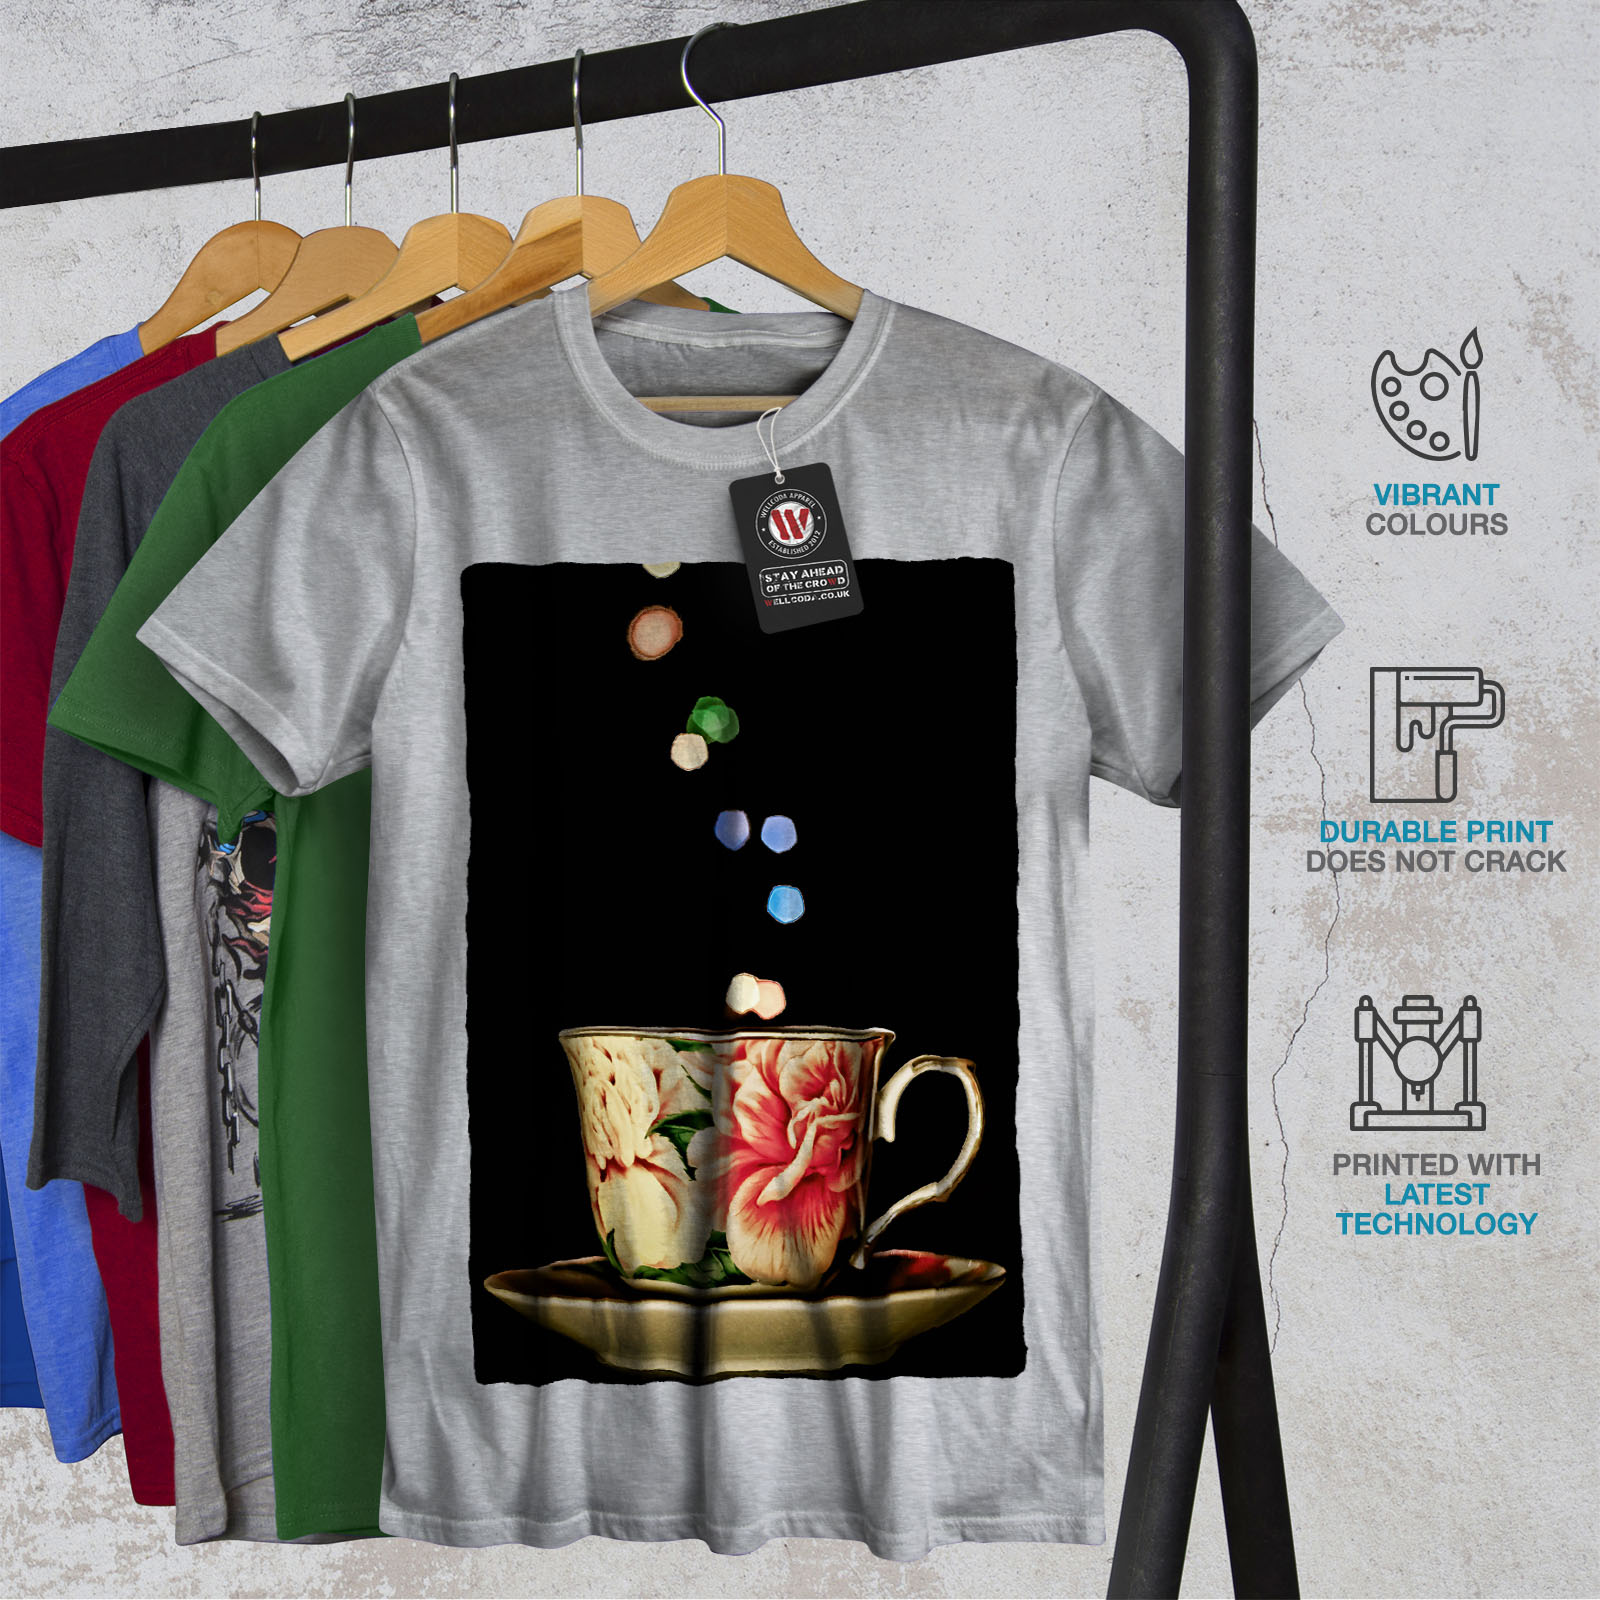 Wellcoda-Tea-Cup-Retro-Old-Mens-T-shirt-Smell-Graphic-Design-Printed-Tee thumbnail 18